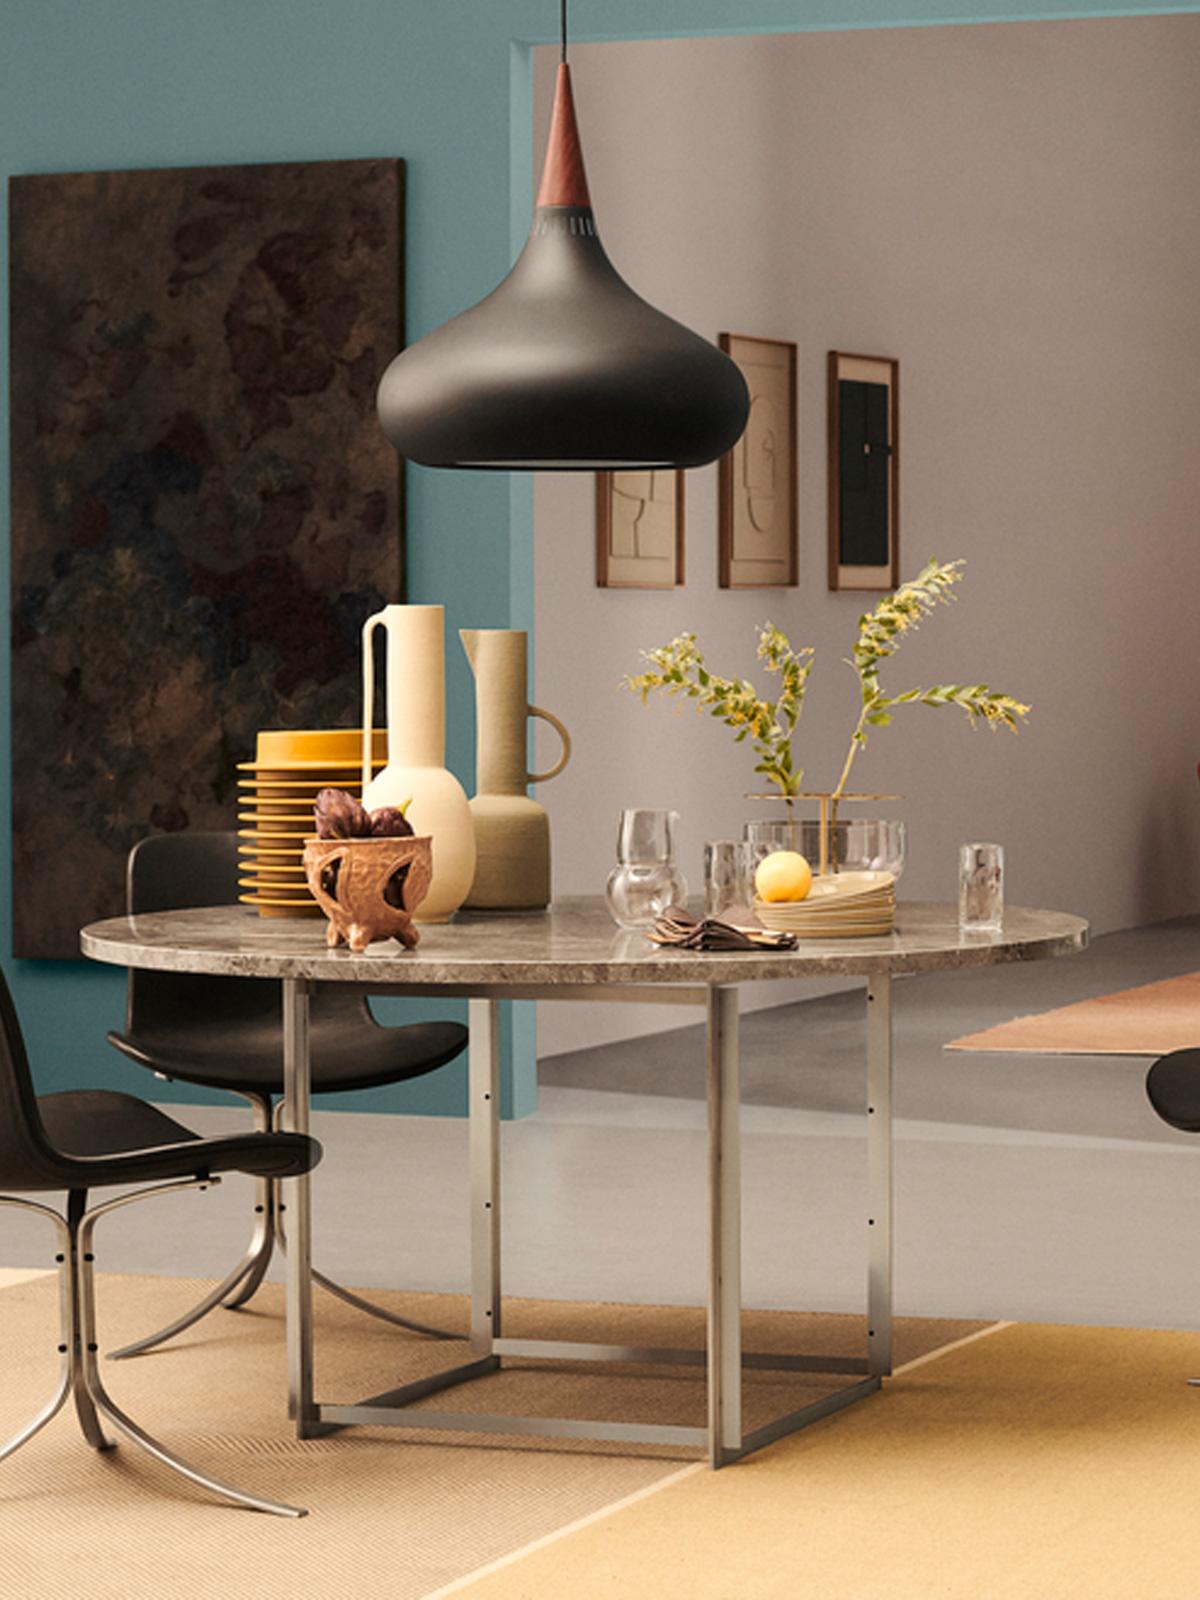 DesignOrt Blog: Designer im Portrait Jo Hammerborg Orient Black Fritz Hansen Designort